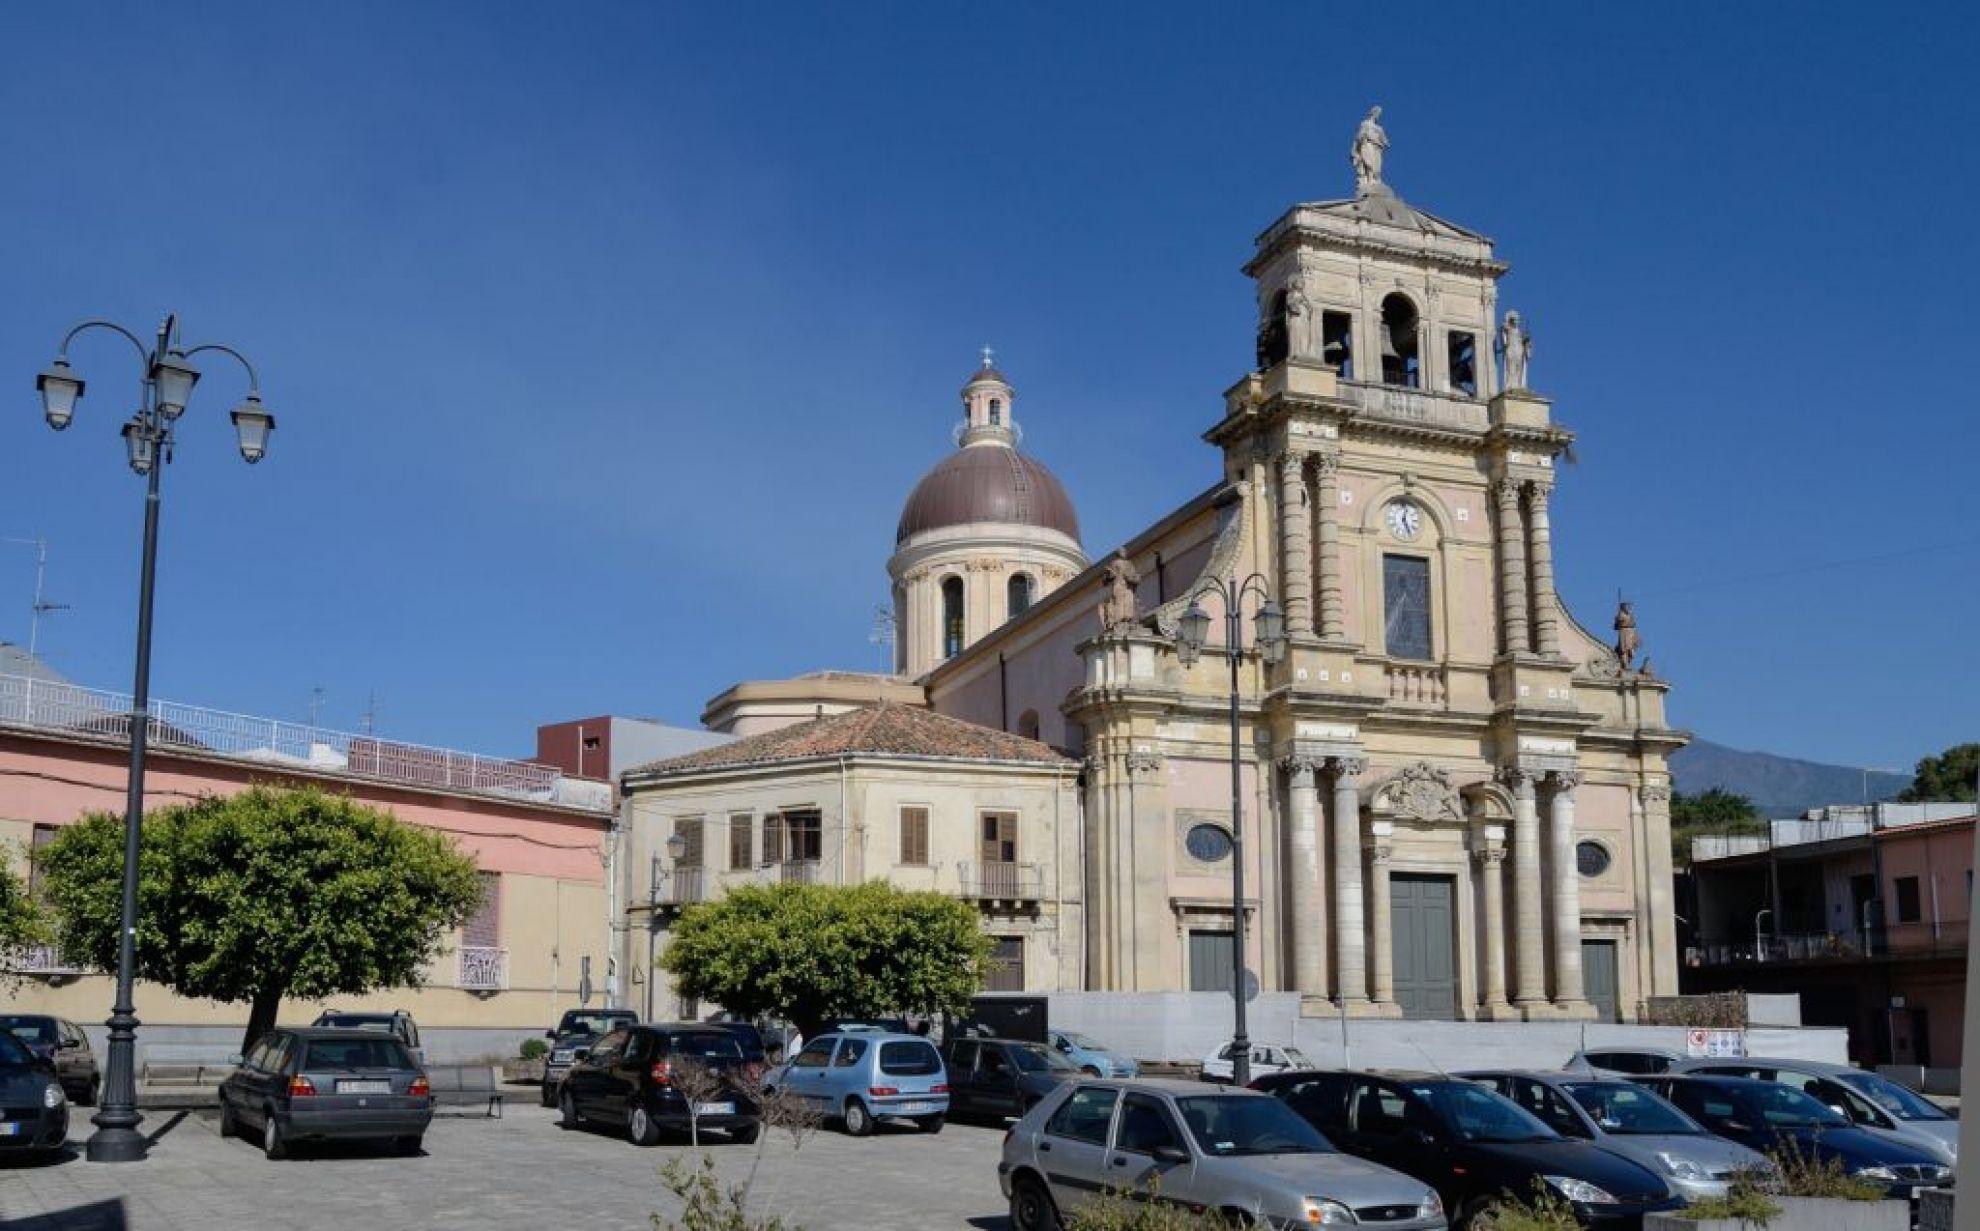 Chiesa Sacro Cuore di Gesù